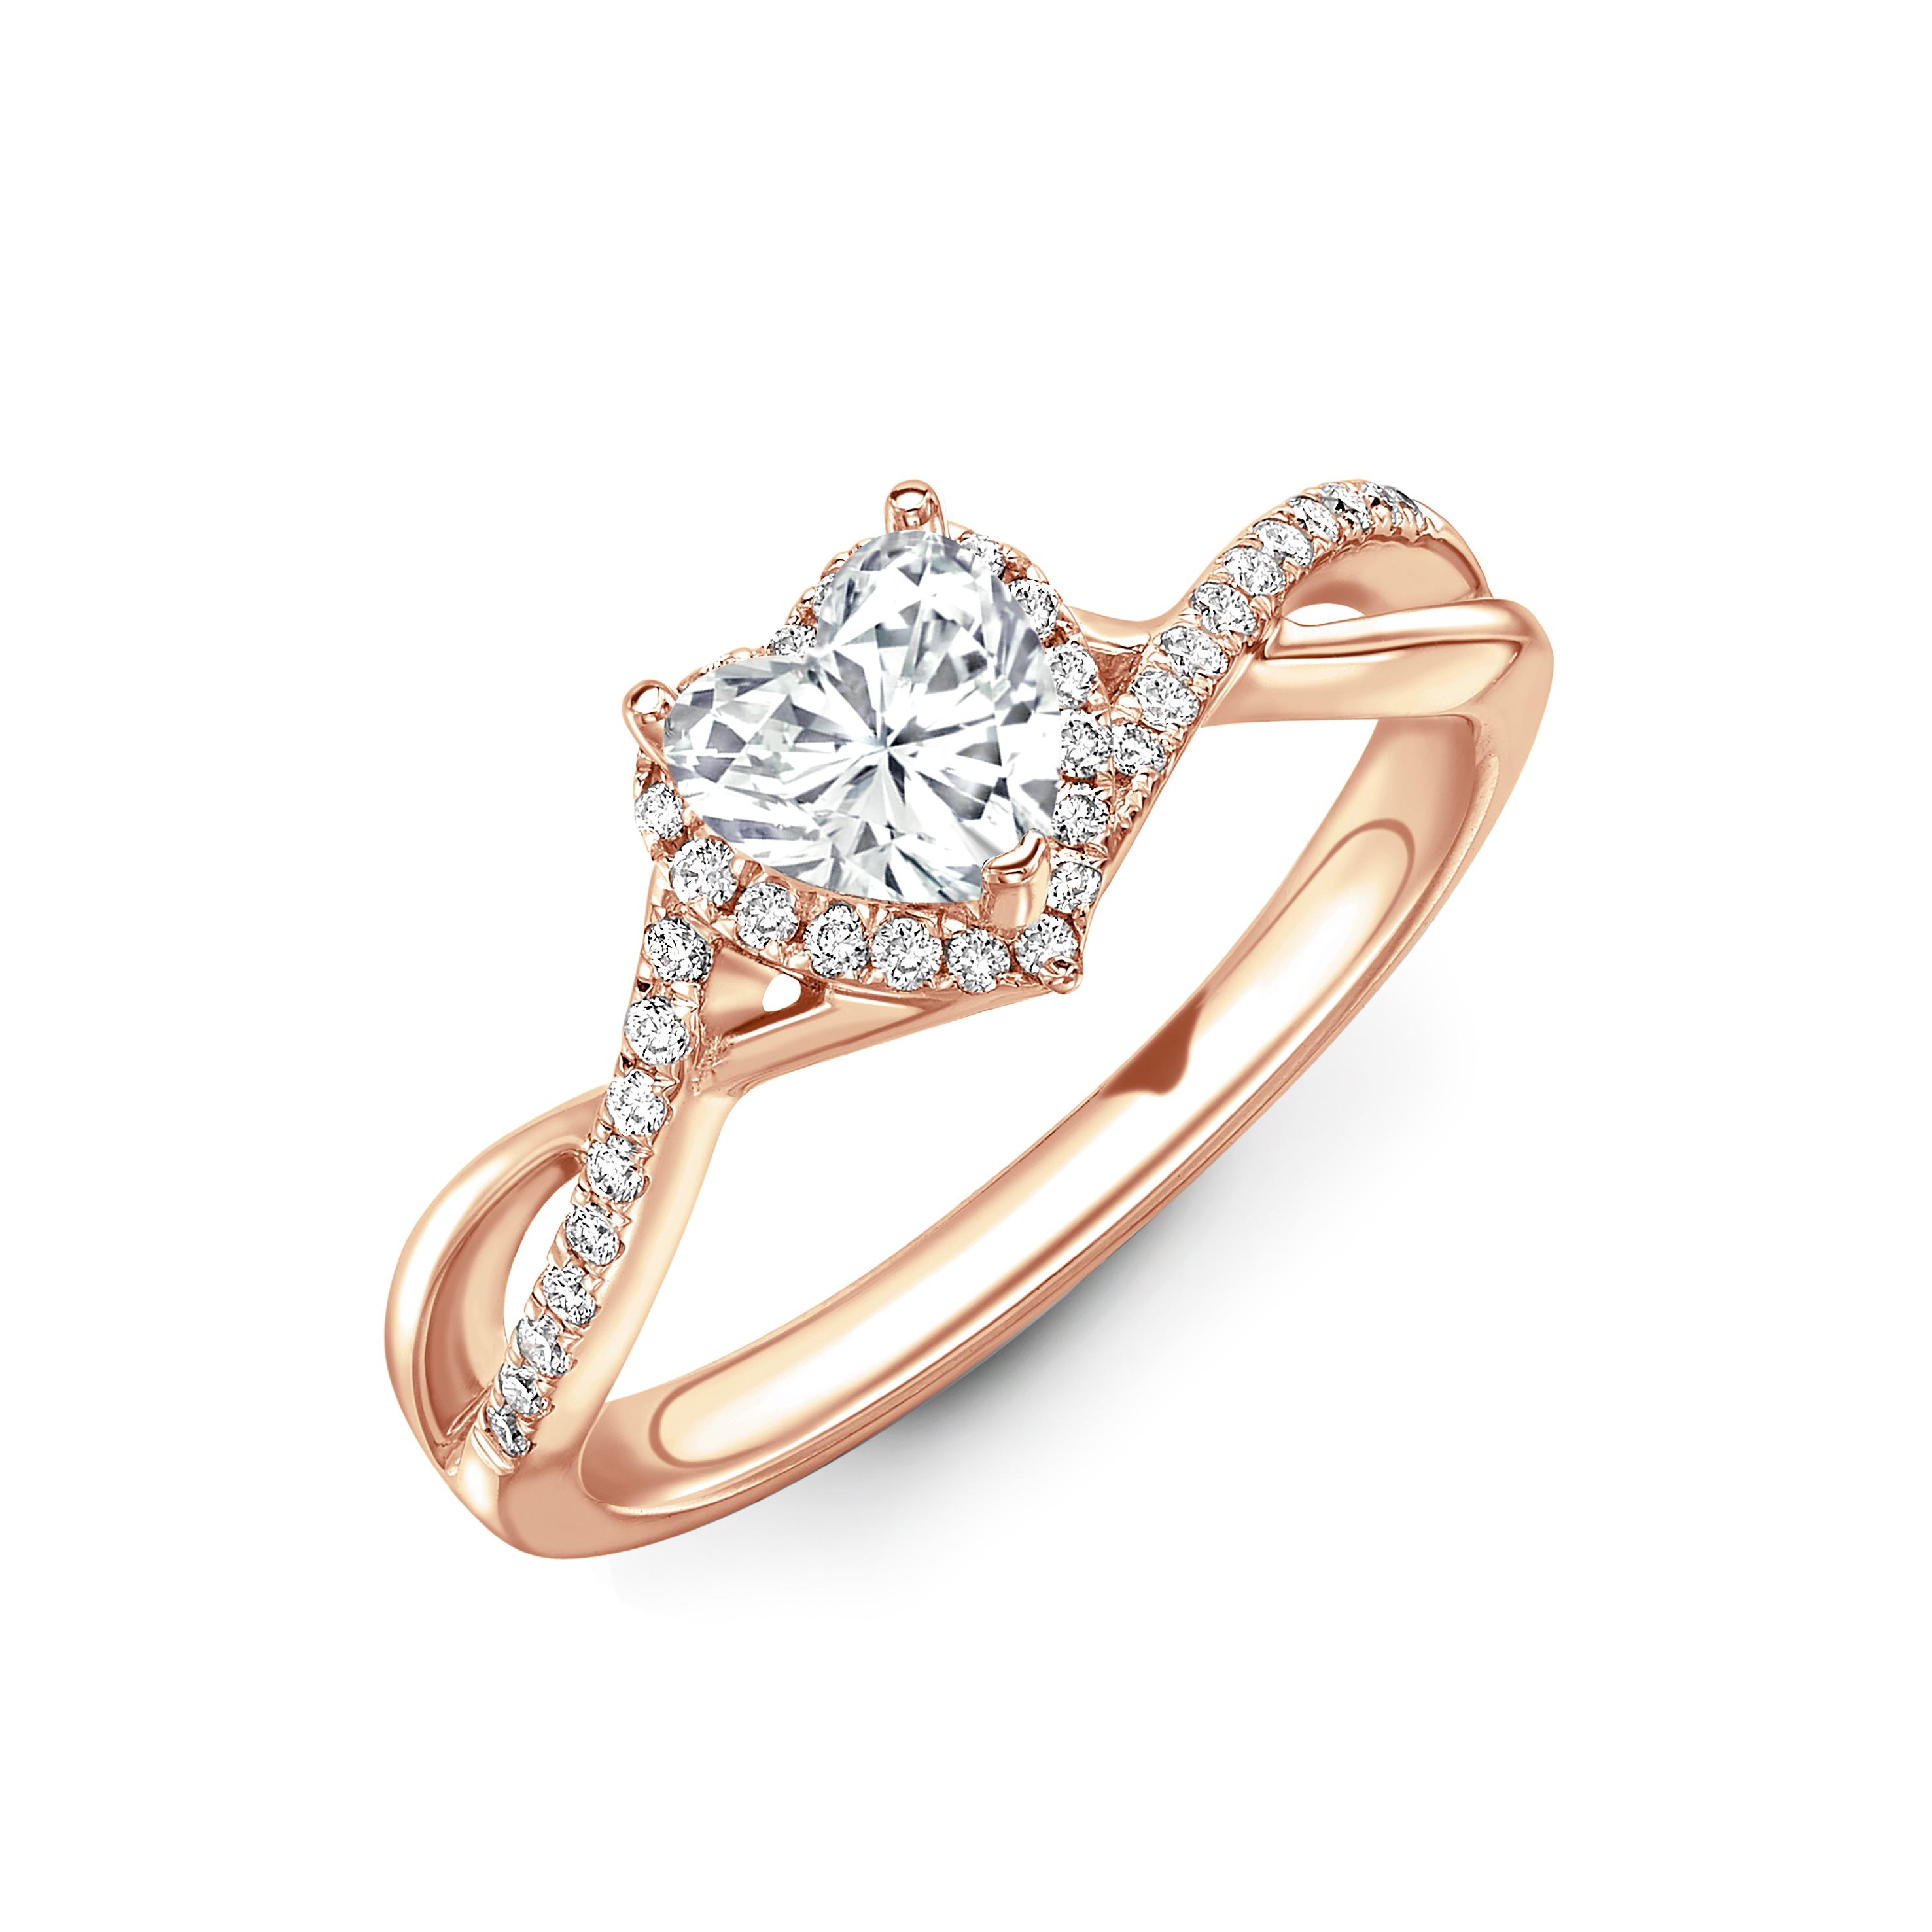 4527d8b7c60f4 Buy Heart Shape 2 Raw Delicate Shoulder Halo Diamond Engagement ...